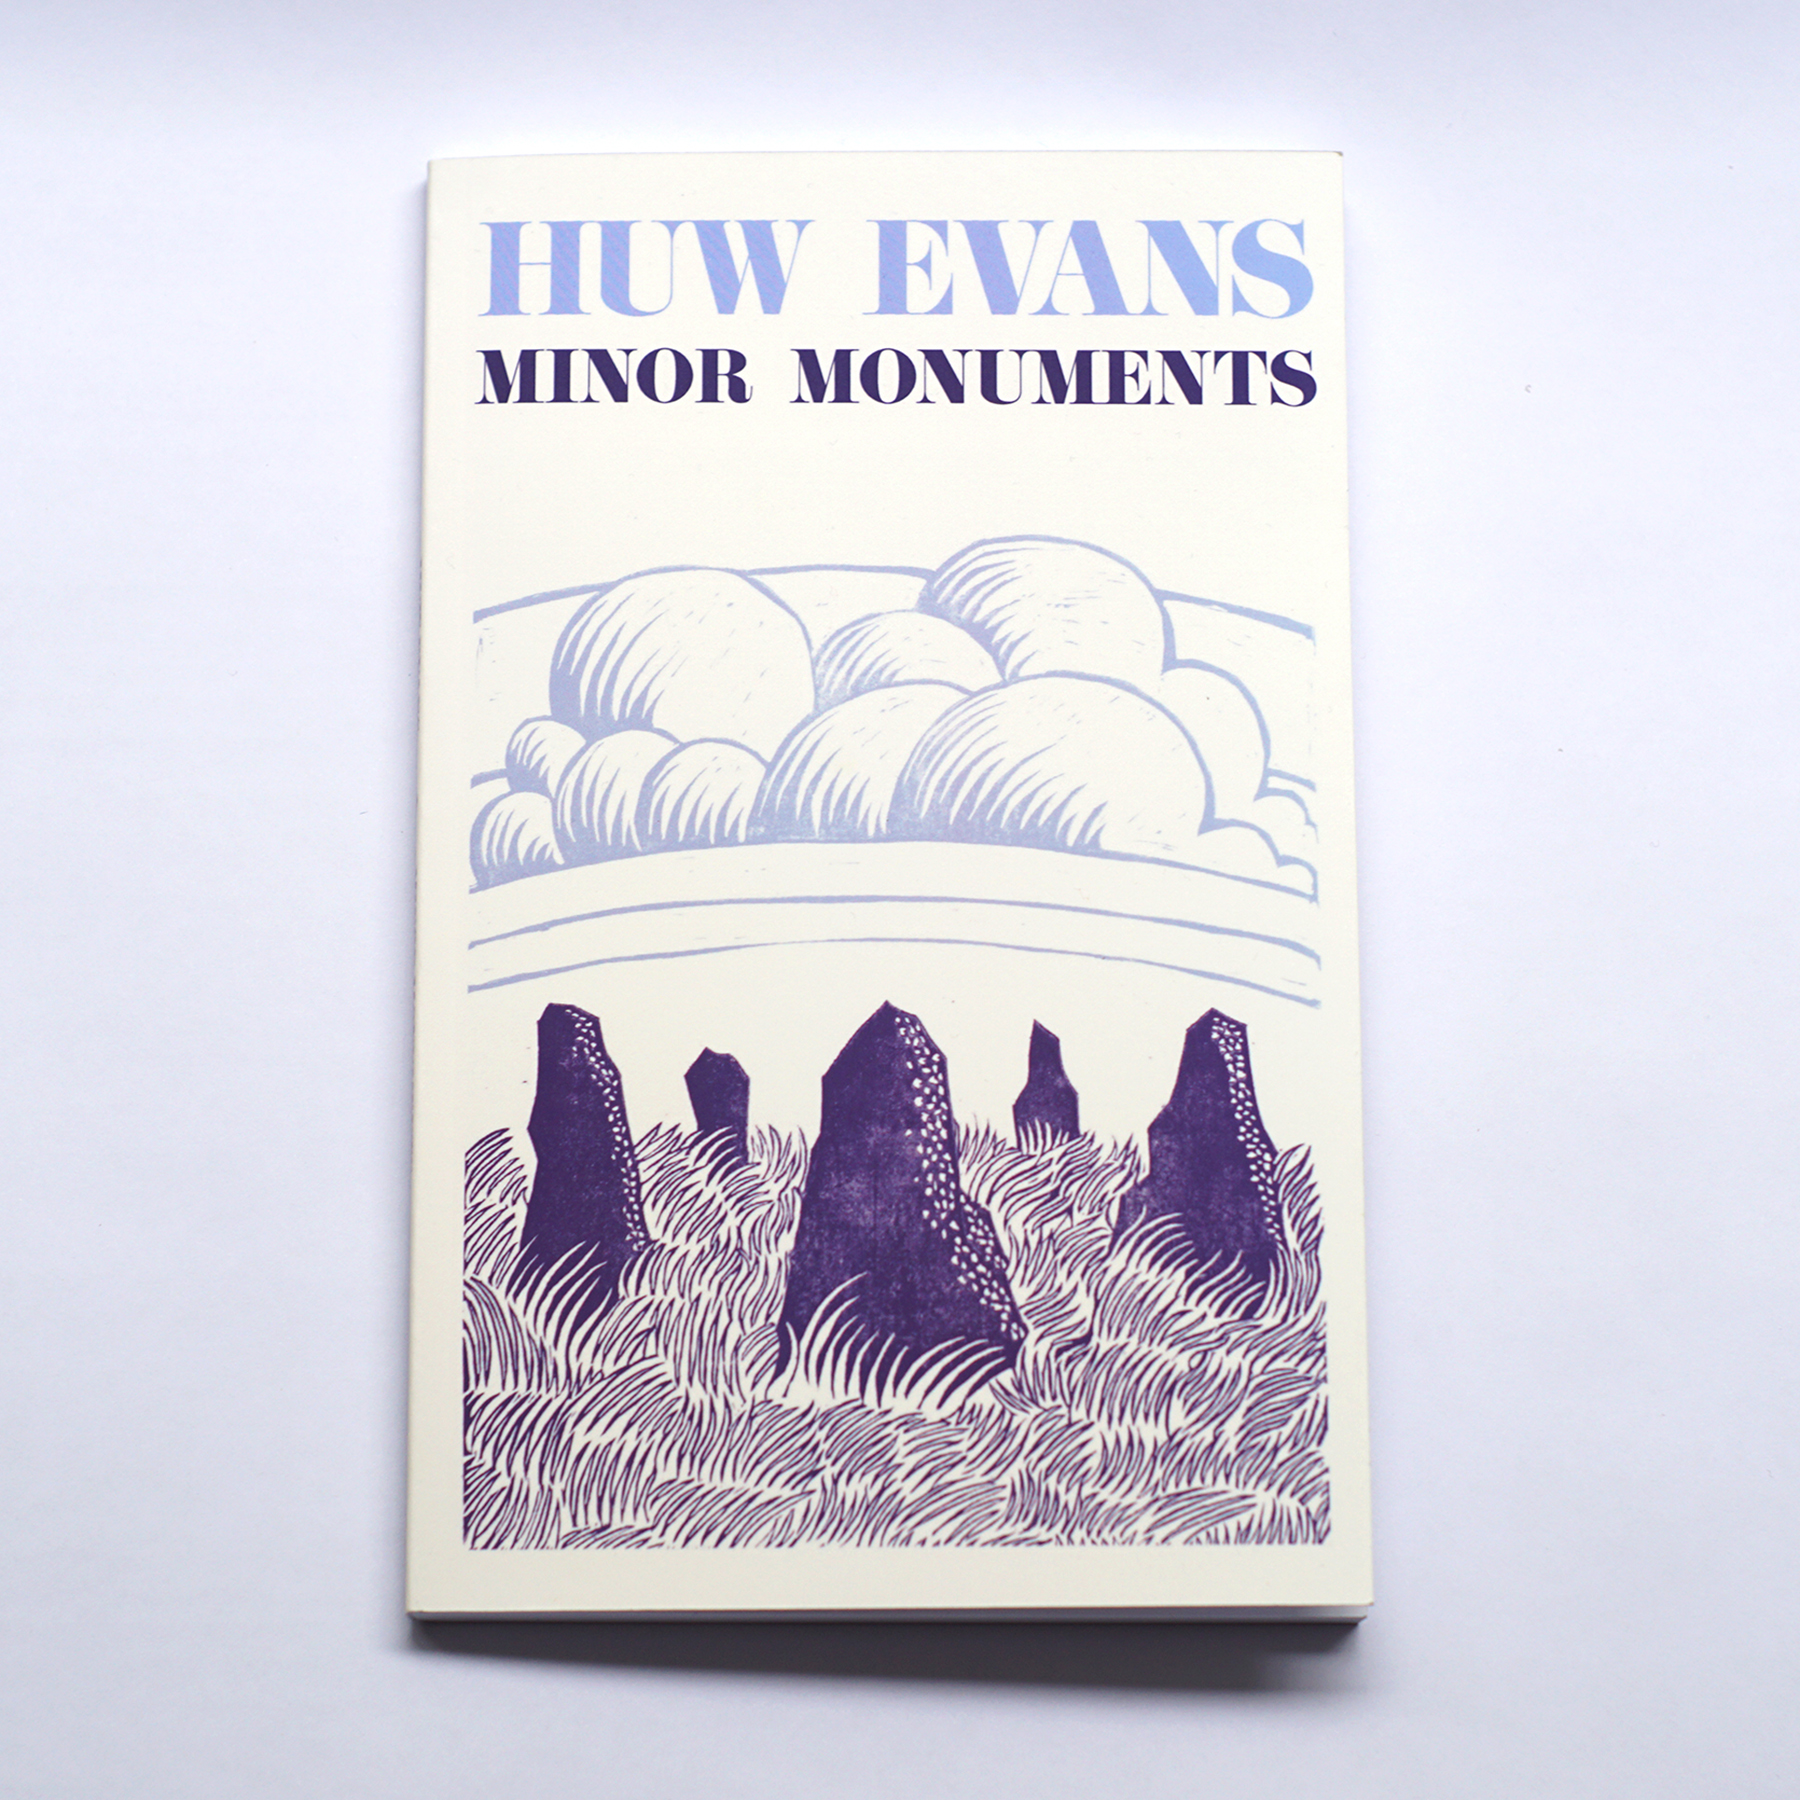 Huw Evans Poetry Minor Monuments Sputnik Patrons